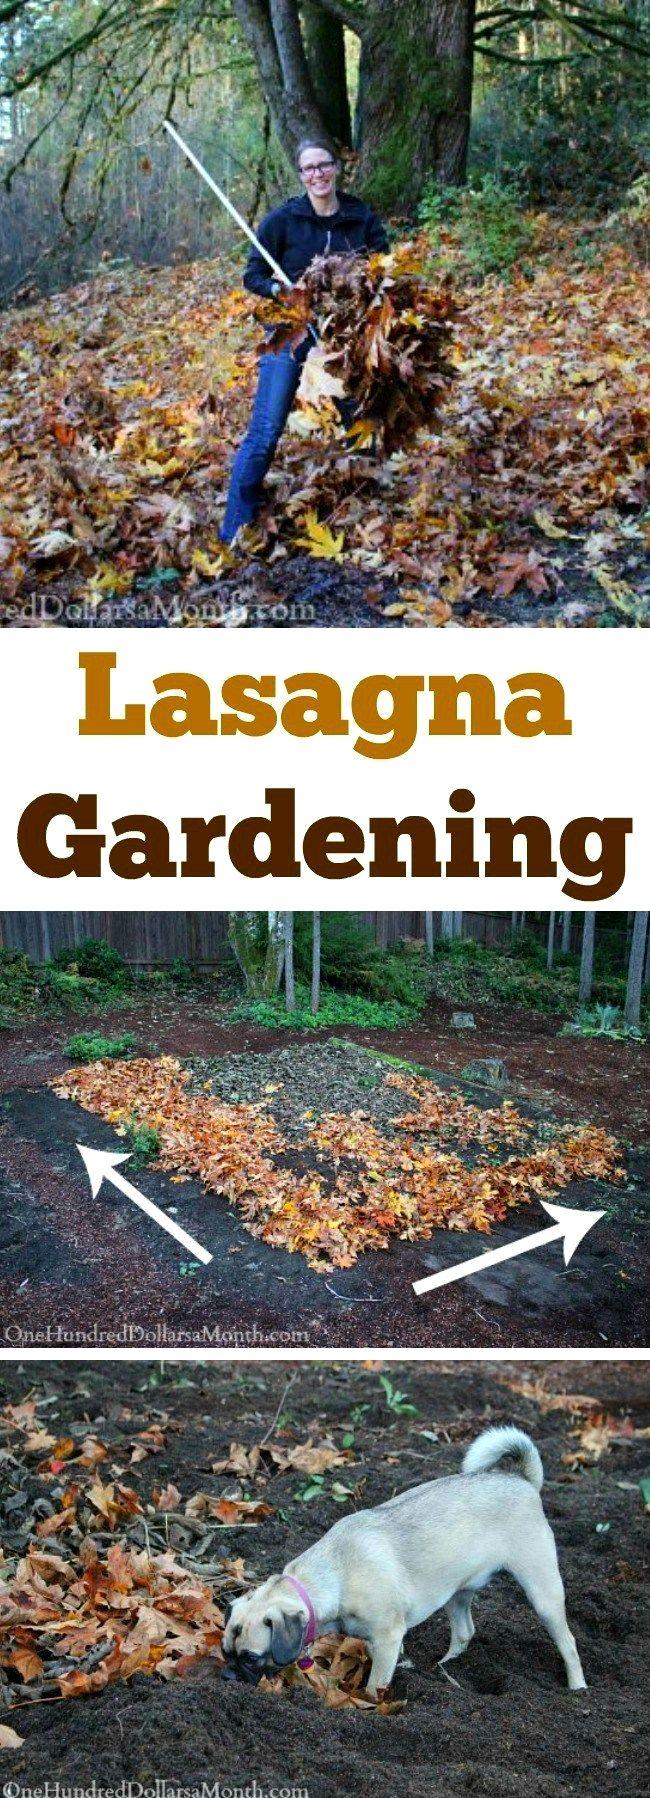 Vegetable Garden Plans Zone 7 in 2020 | Lasagna gardening ...